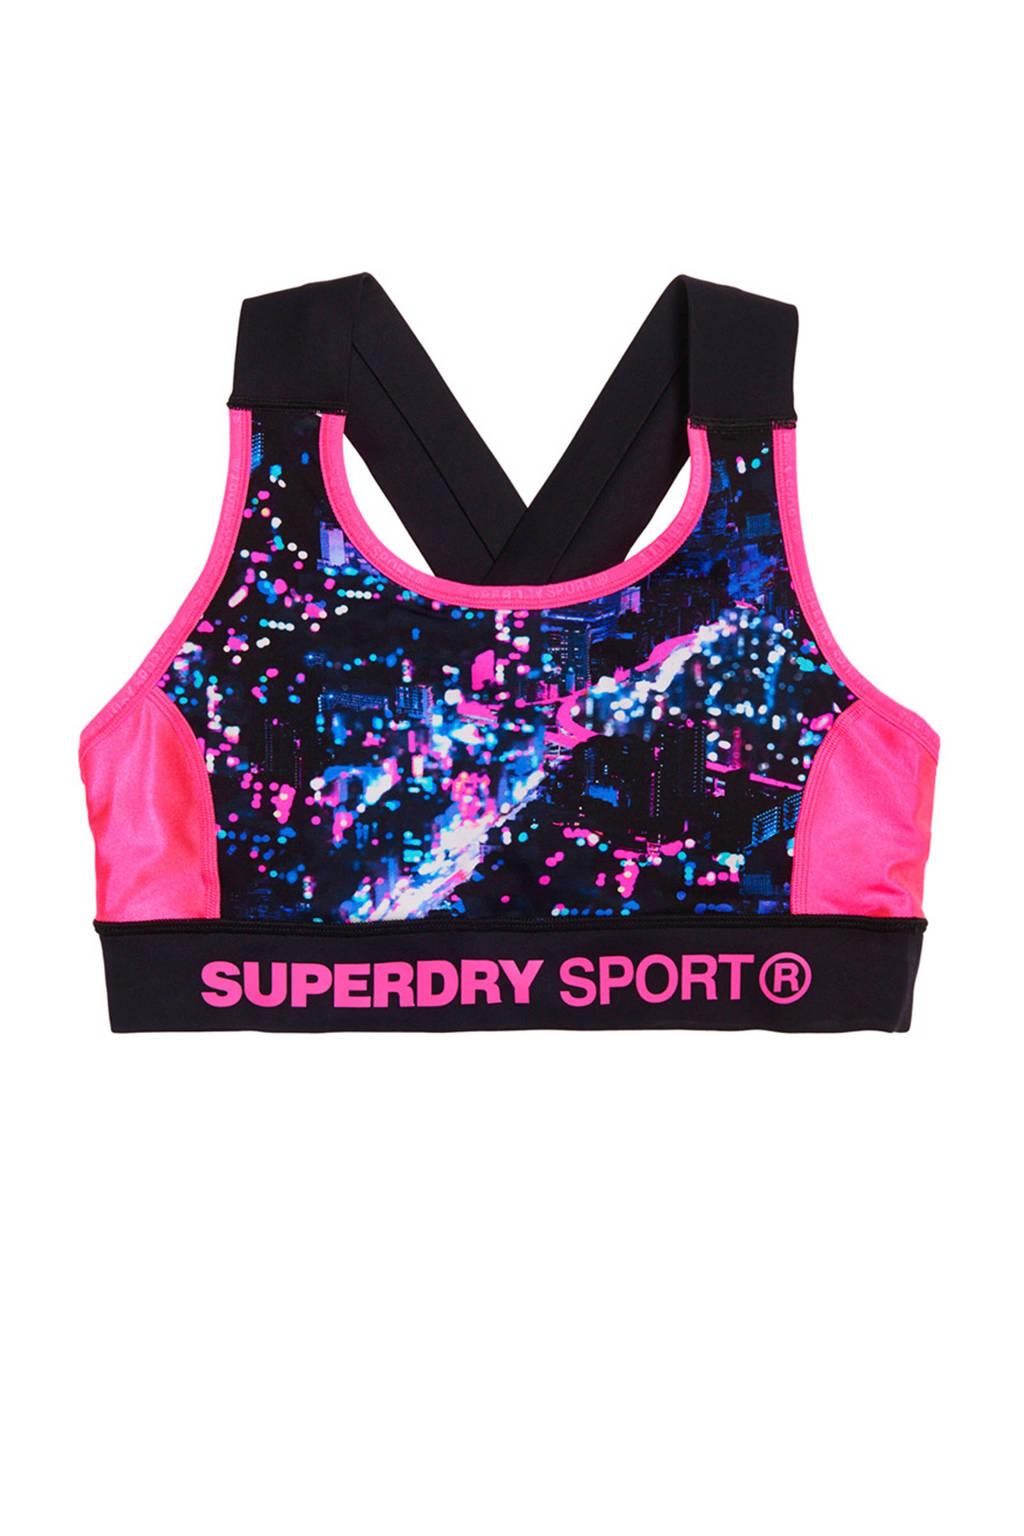 Superdry Sport Level 1 sportbh, Roze/blauw/zwart